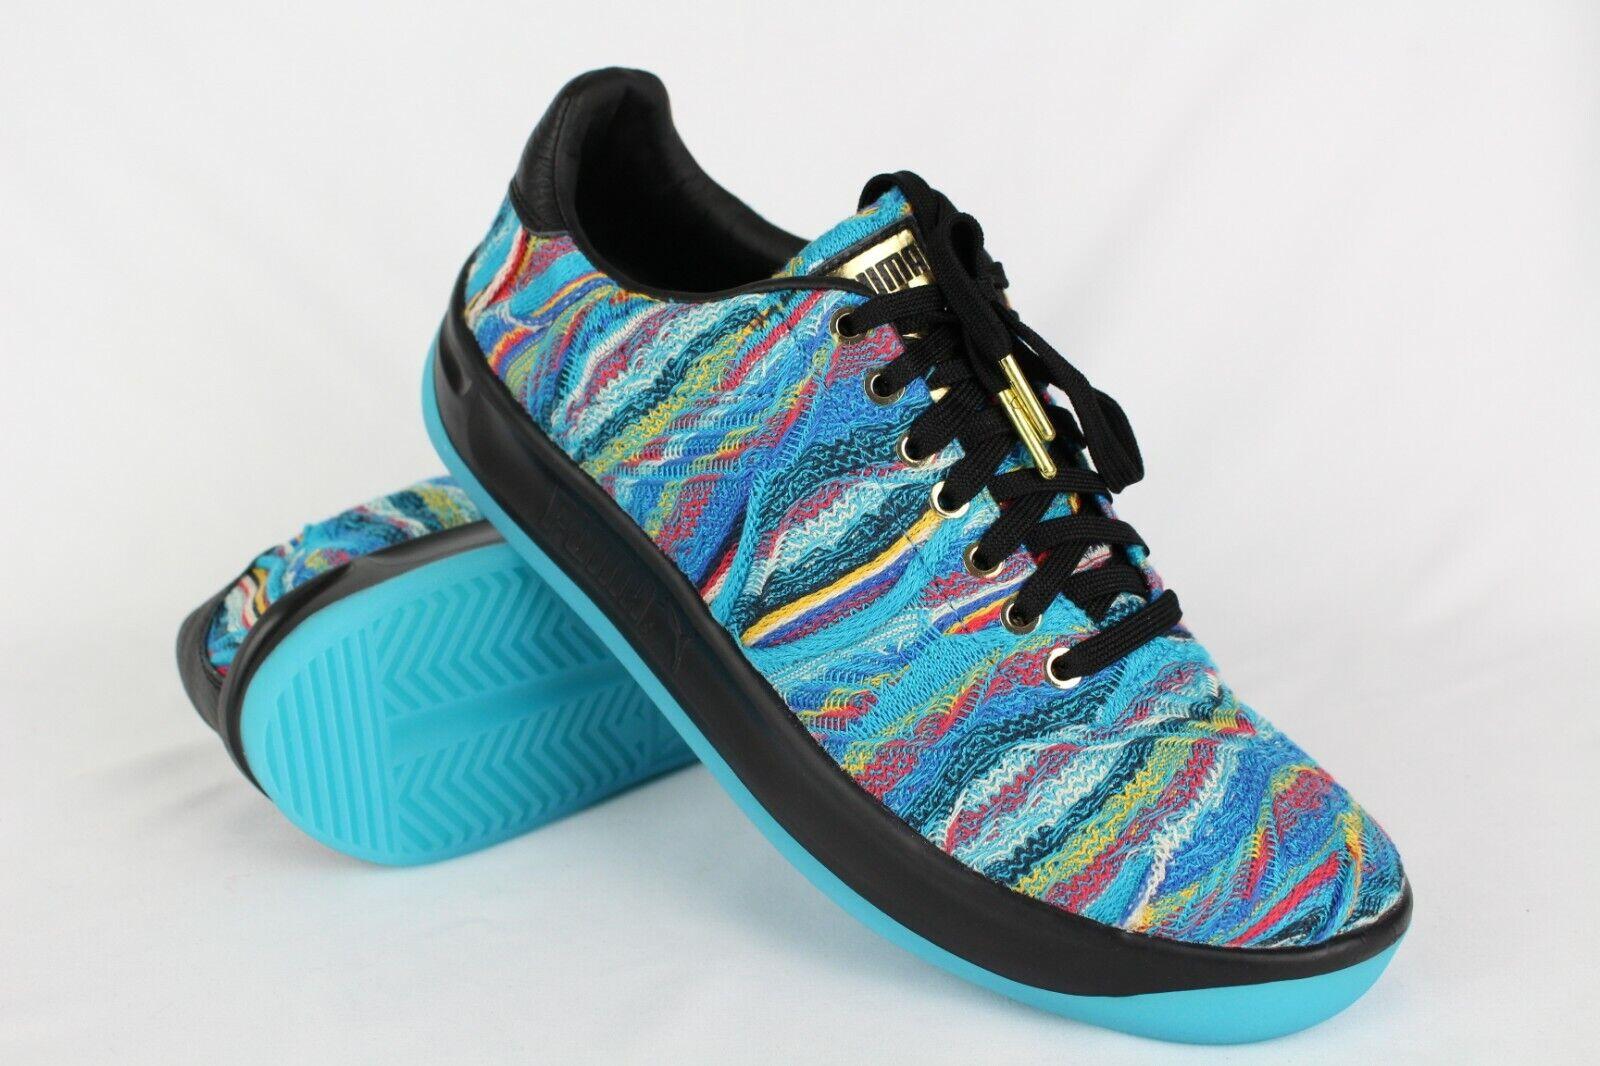 New Puma Men's x COOGI California Sneakers Size 10 bluee Atoll   Black 367973-01